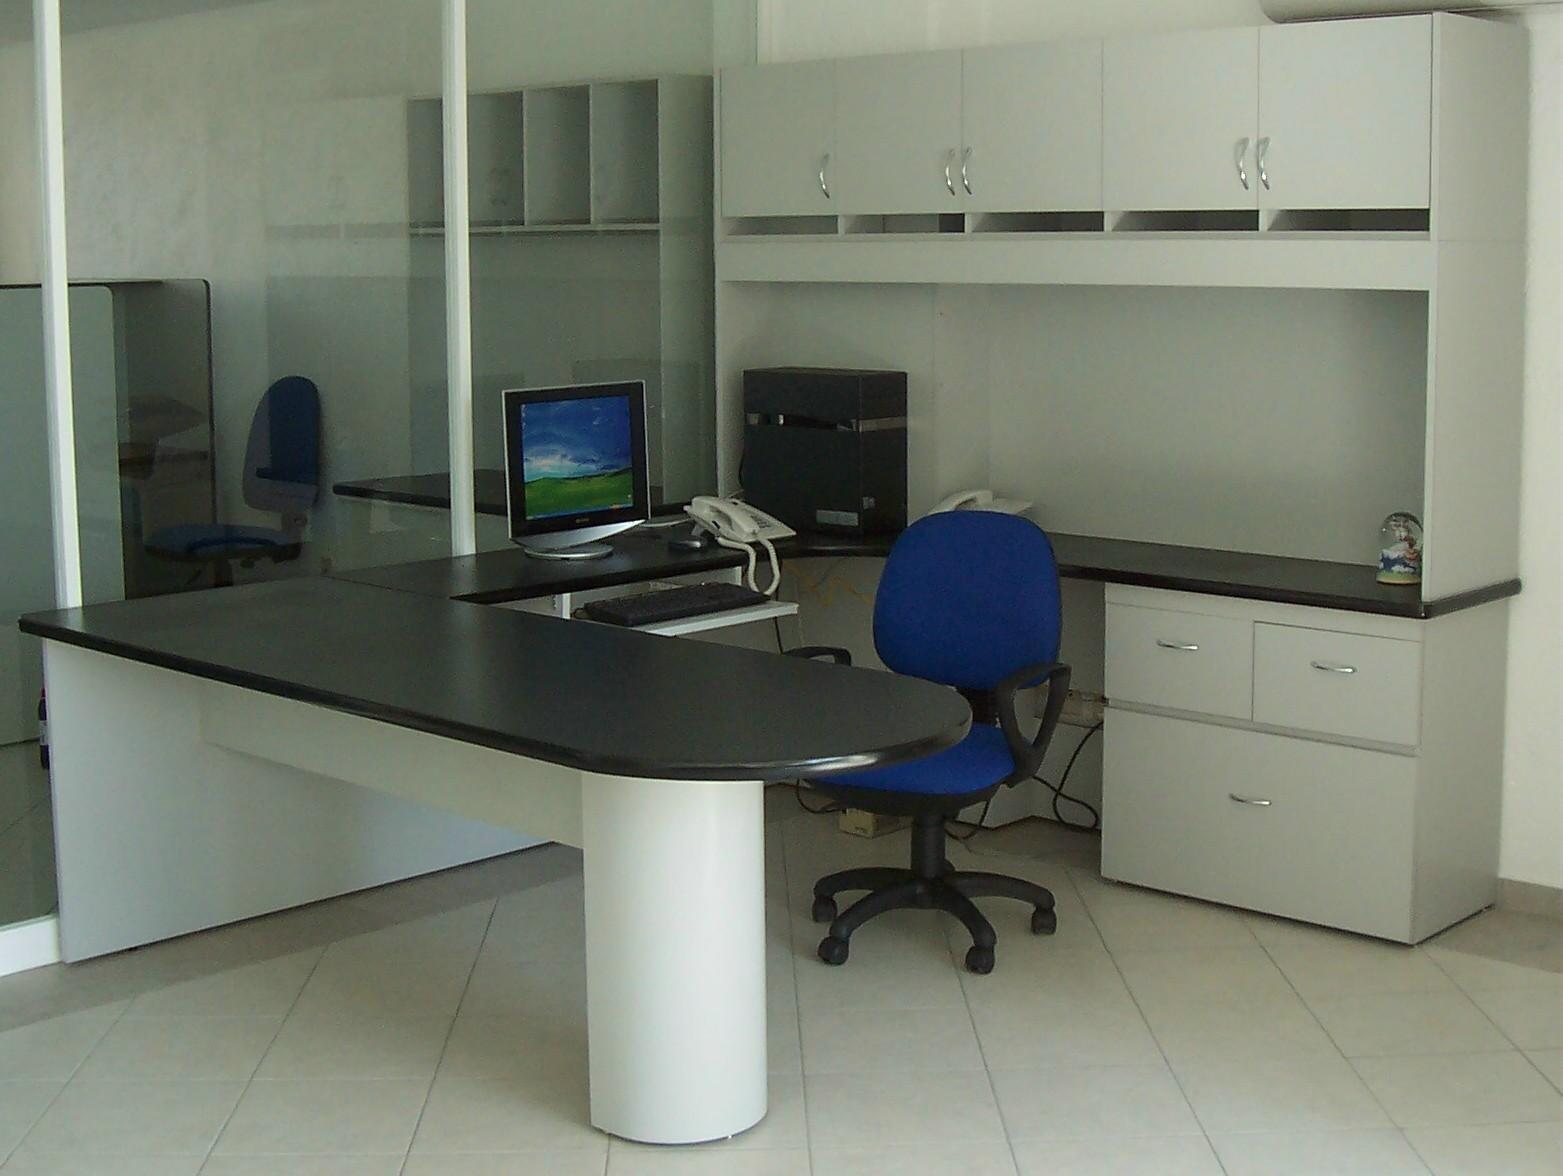 Muebles de oficina muebles de madera mobiliario de for Computadoras para oficina